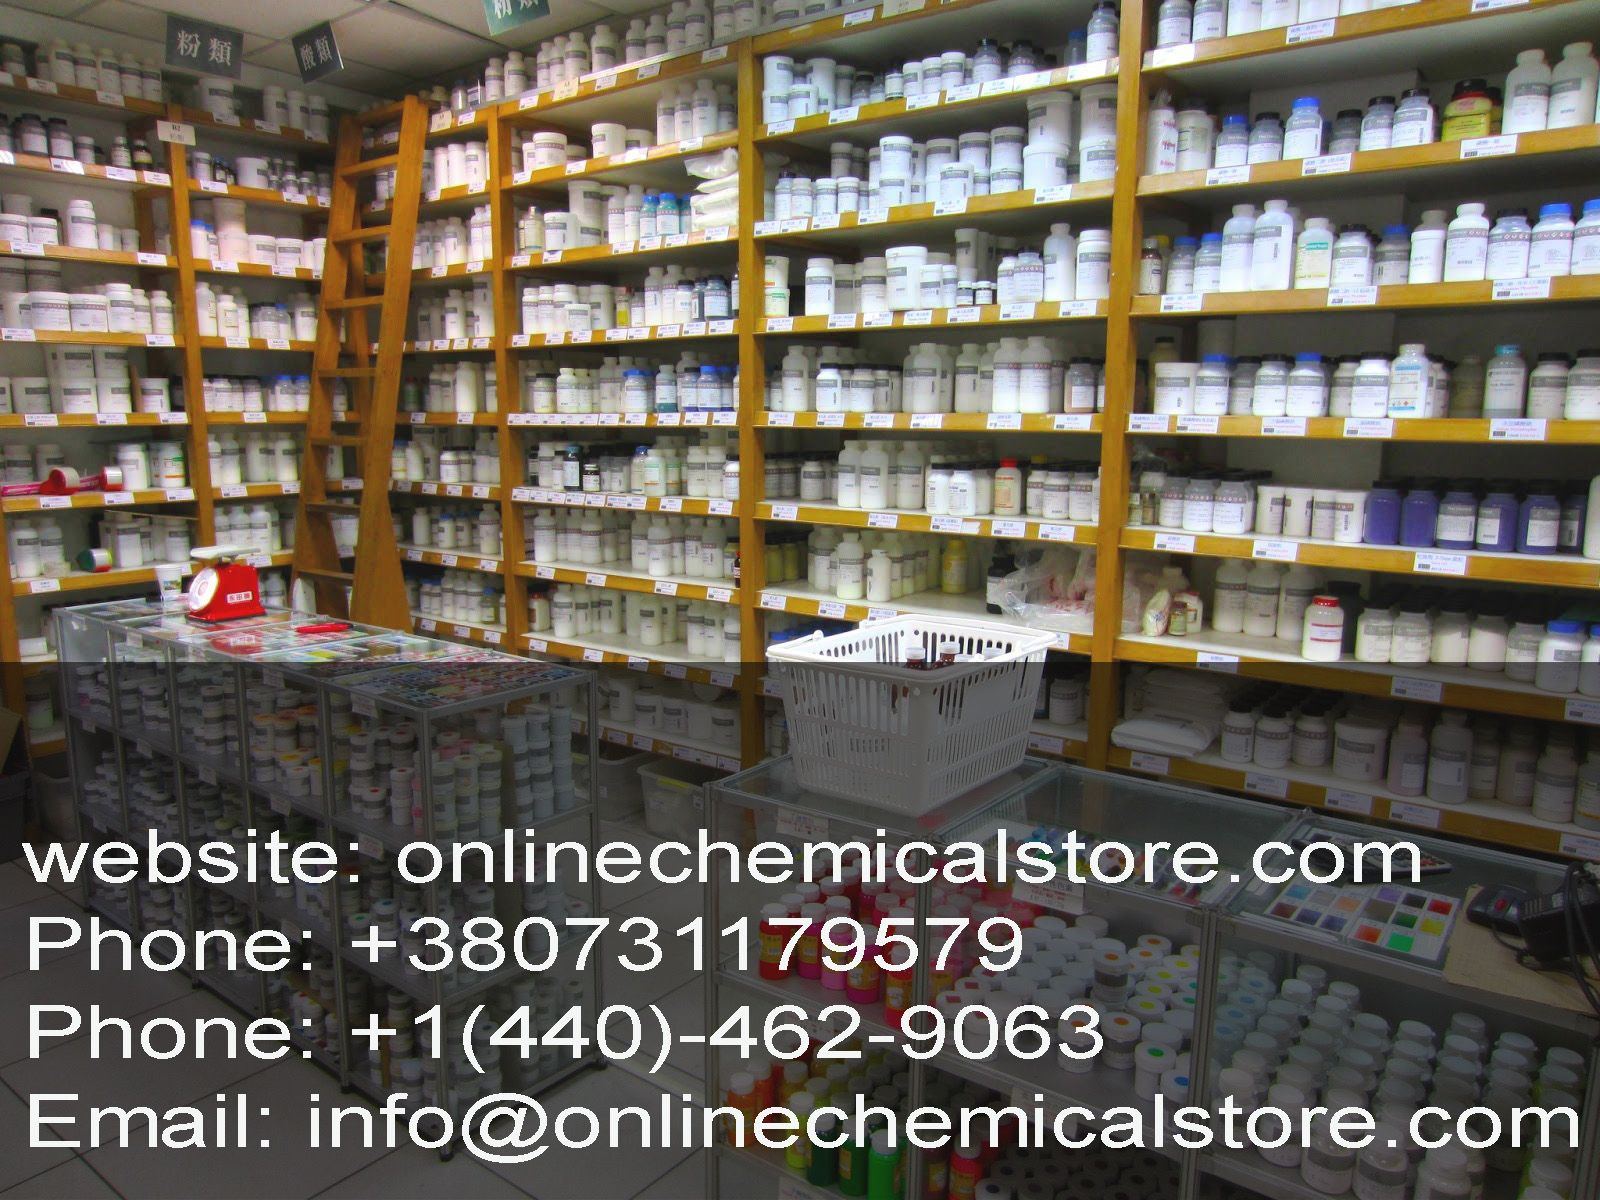 onlinechemicalstore (seo2637) on Pinterest